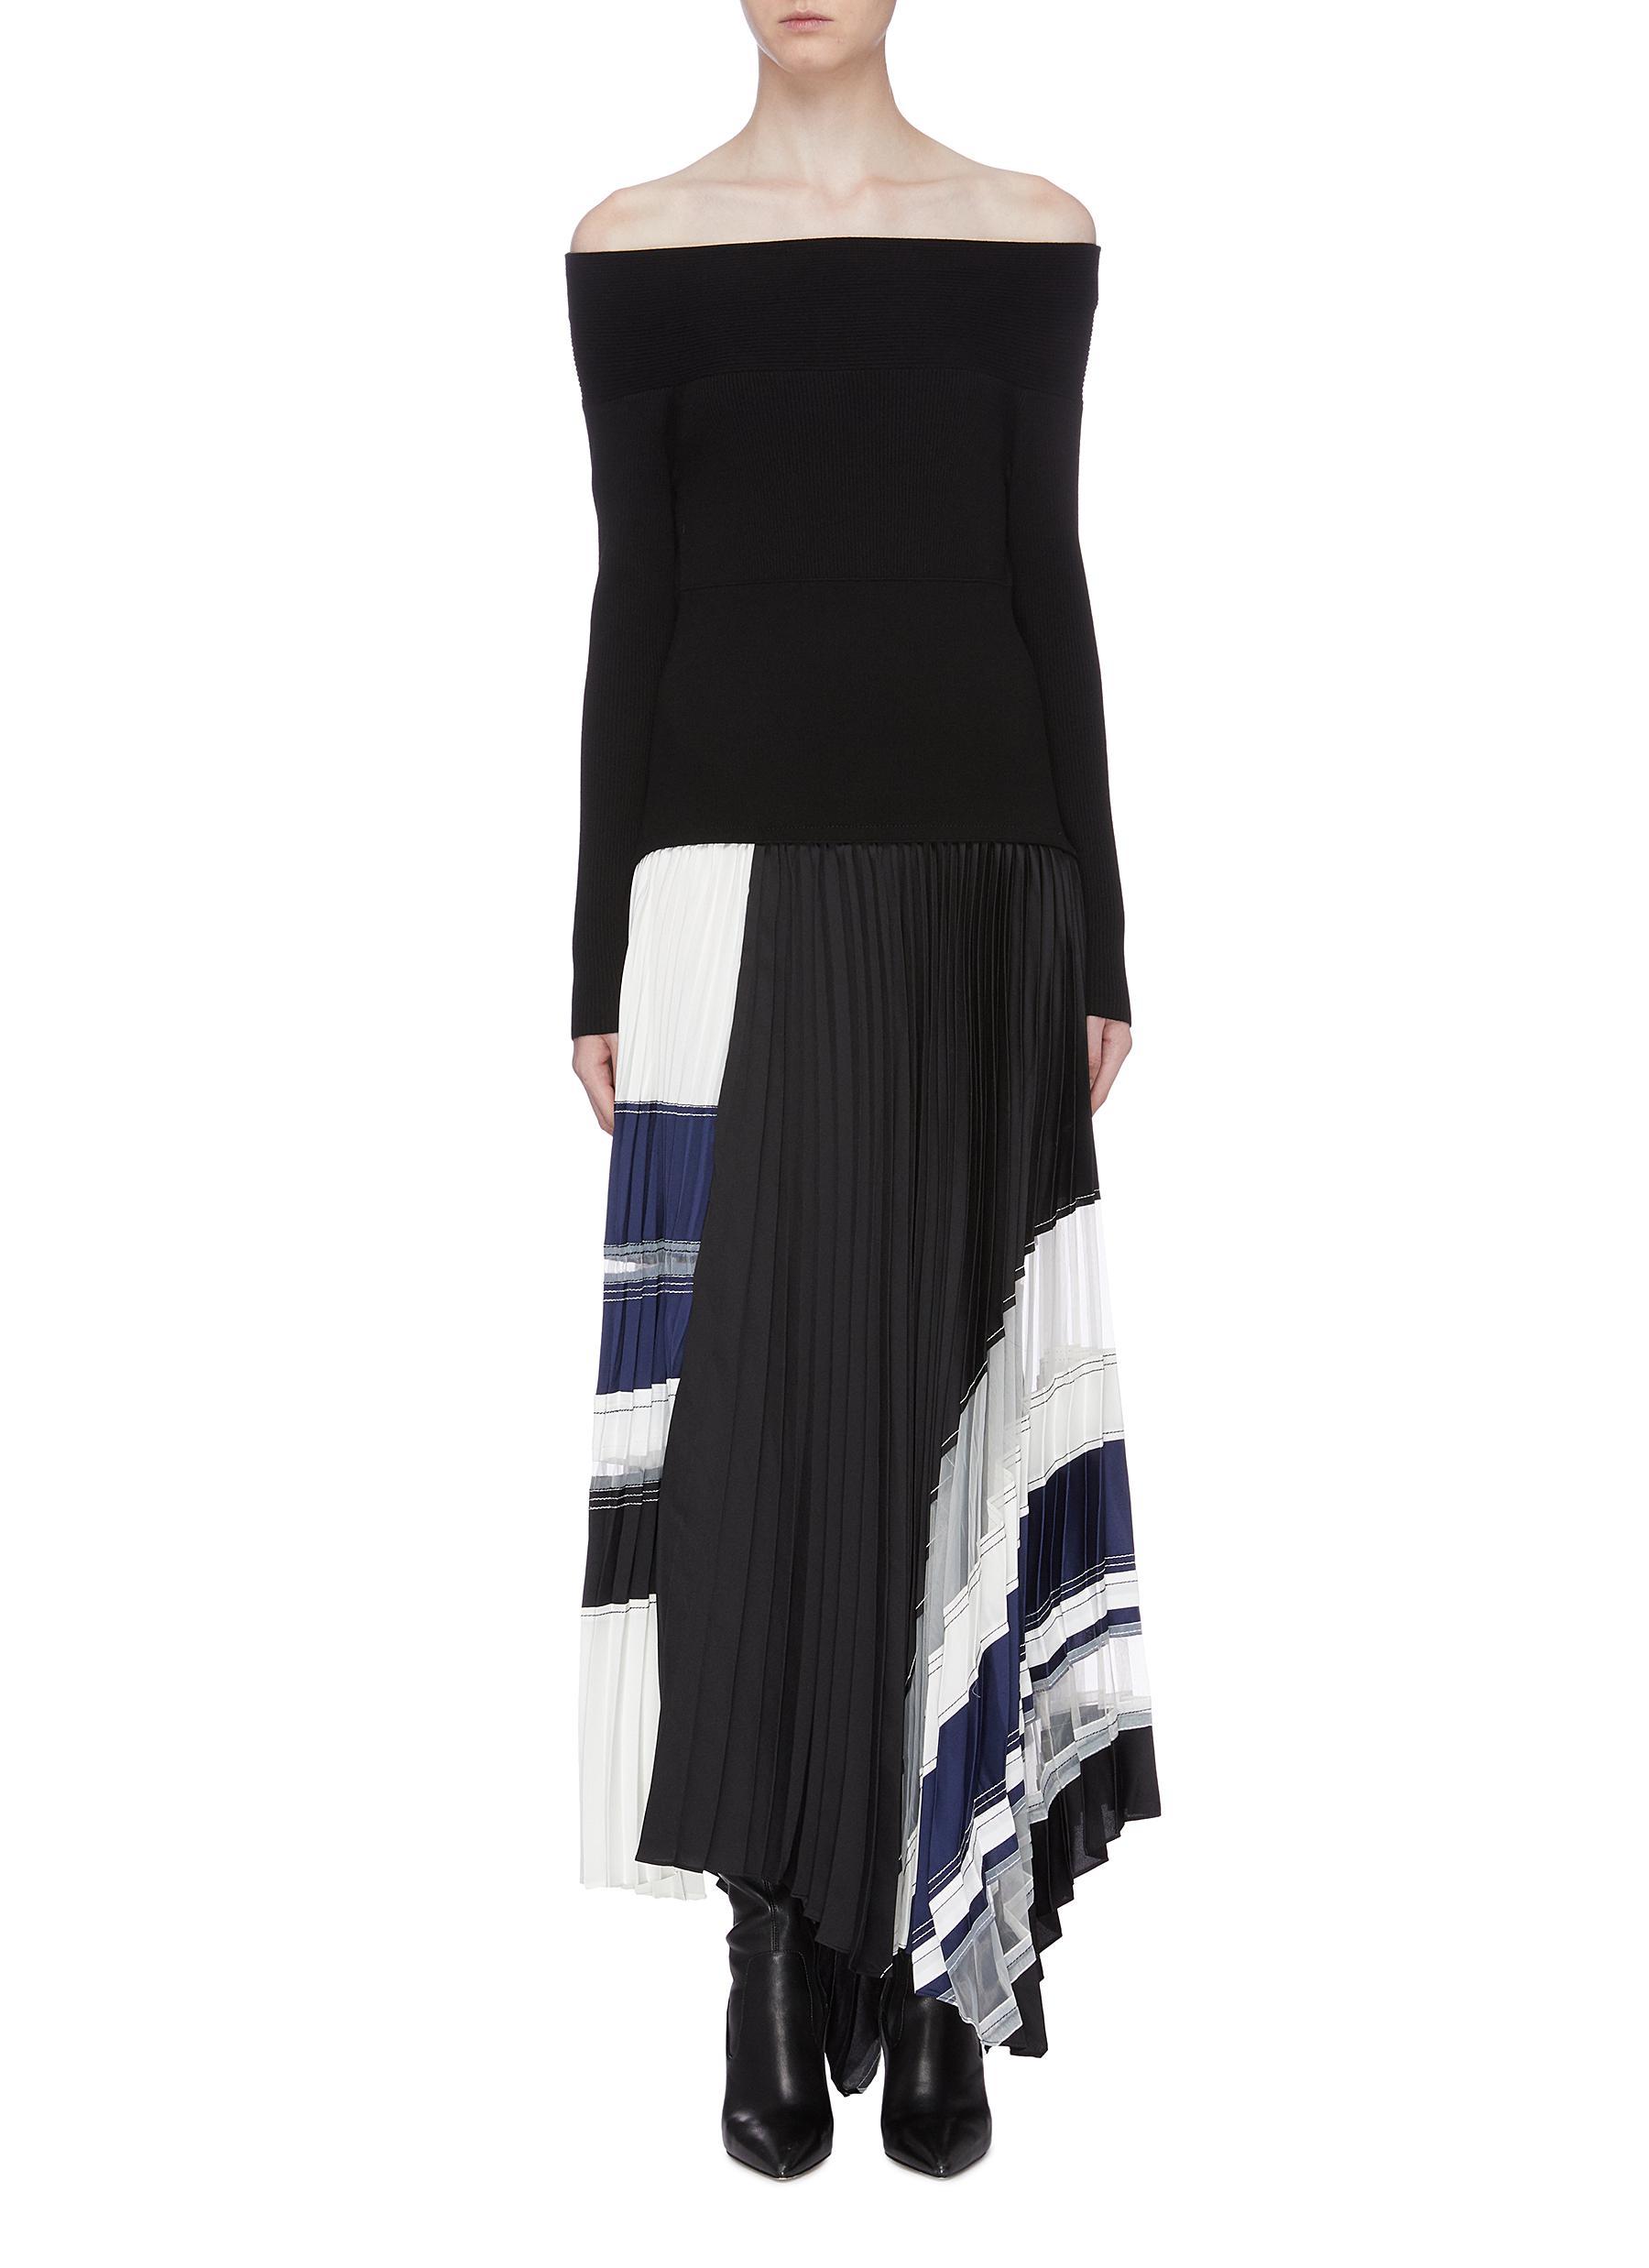 Contrast pleated asymmetric stripe hem off-shoulder dress by 3.1 Phillip Lim